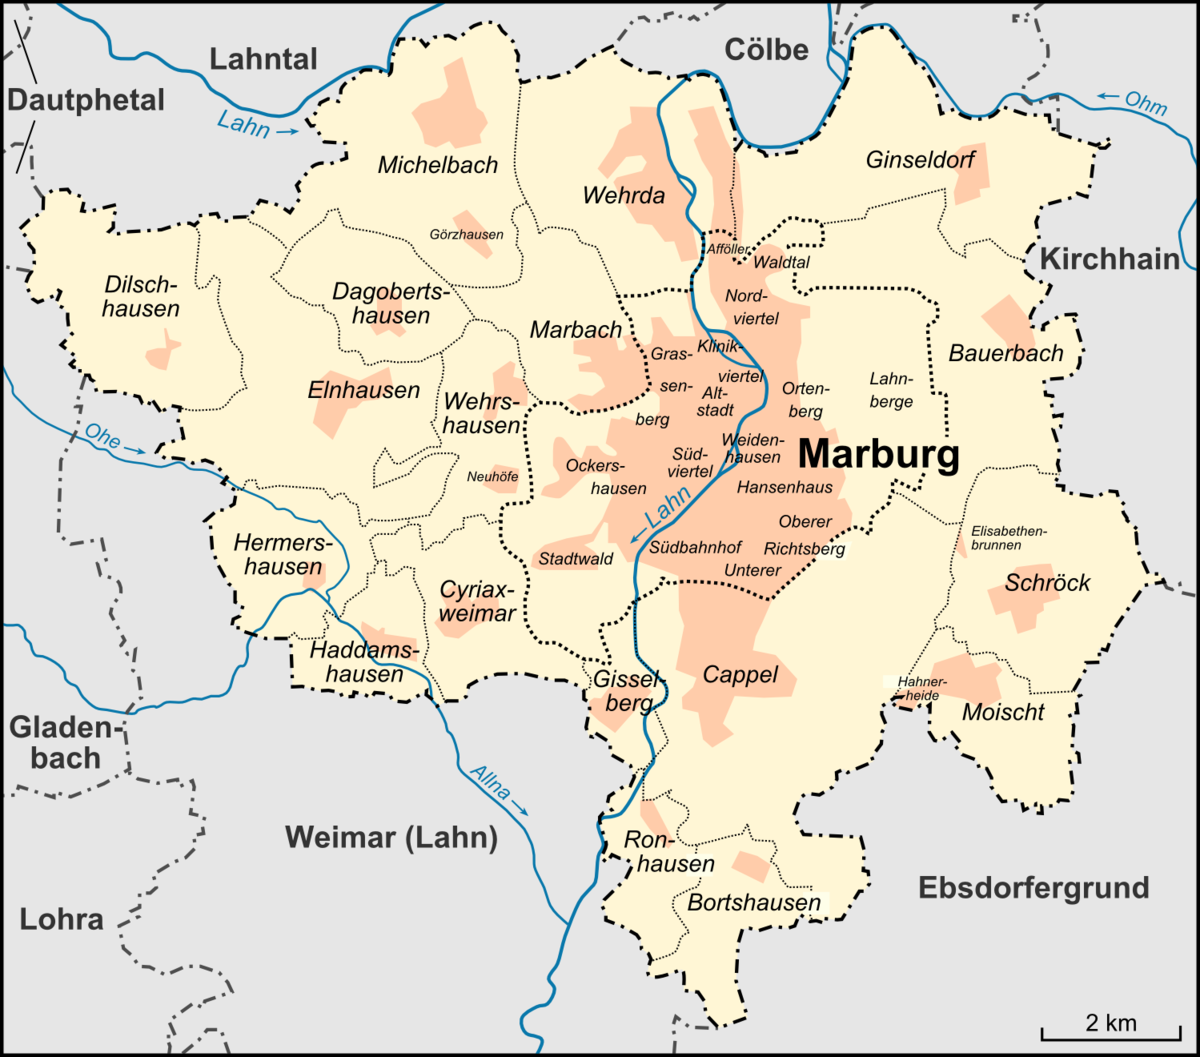 Freiburg Karte Stadtteile.Ortenberg Marburg Wikipedia